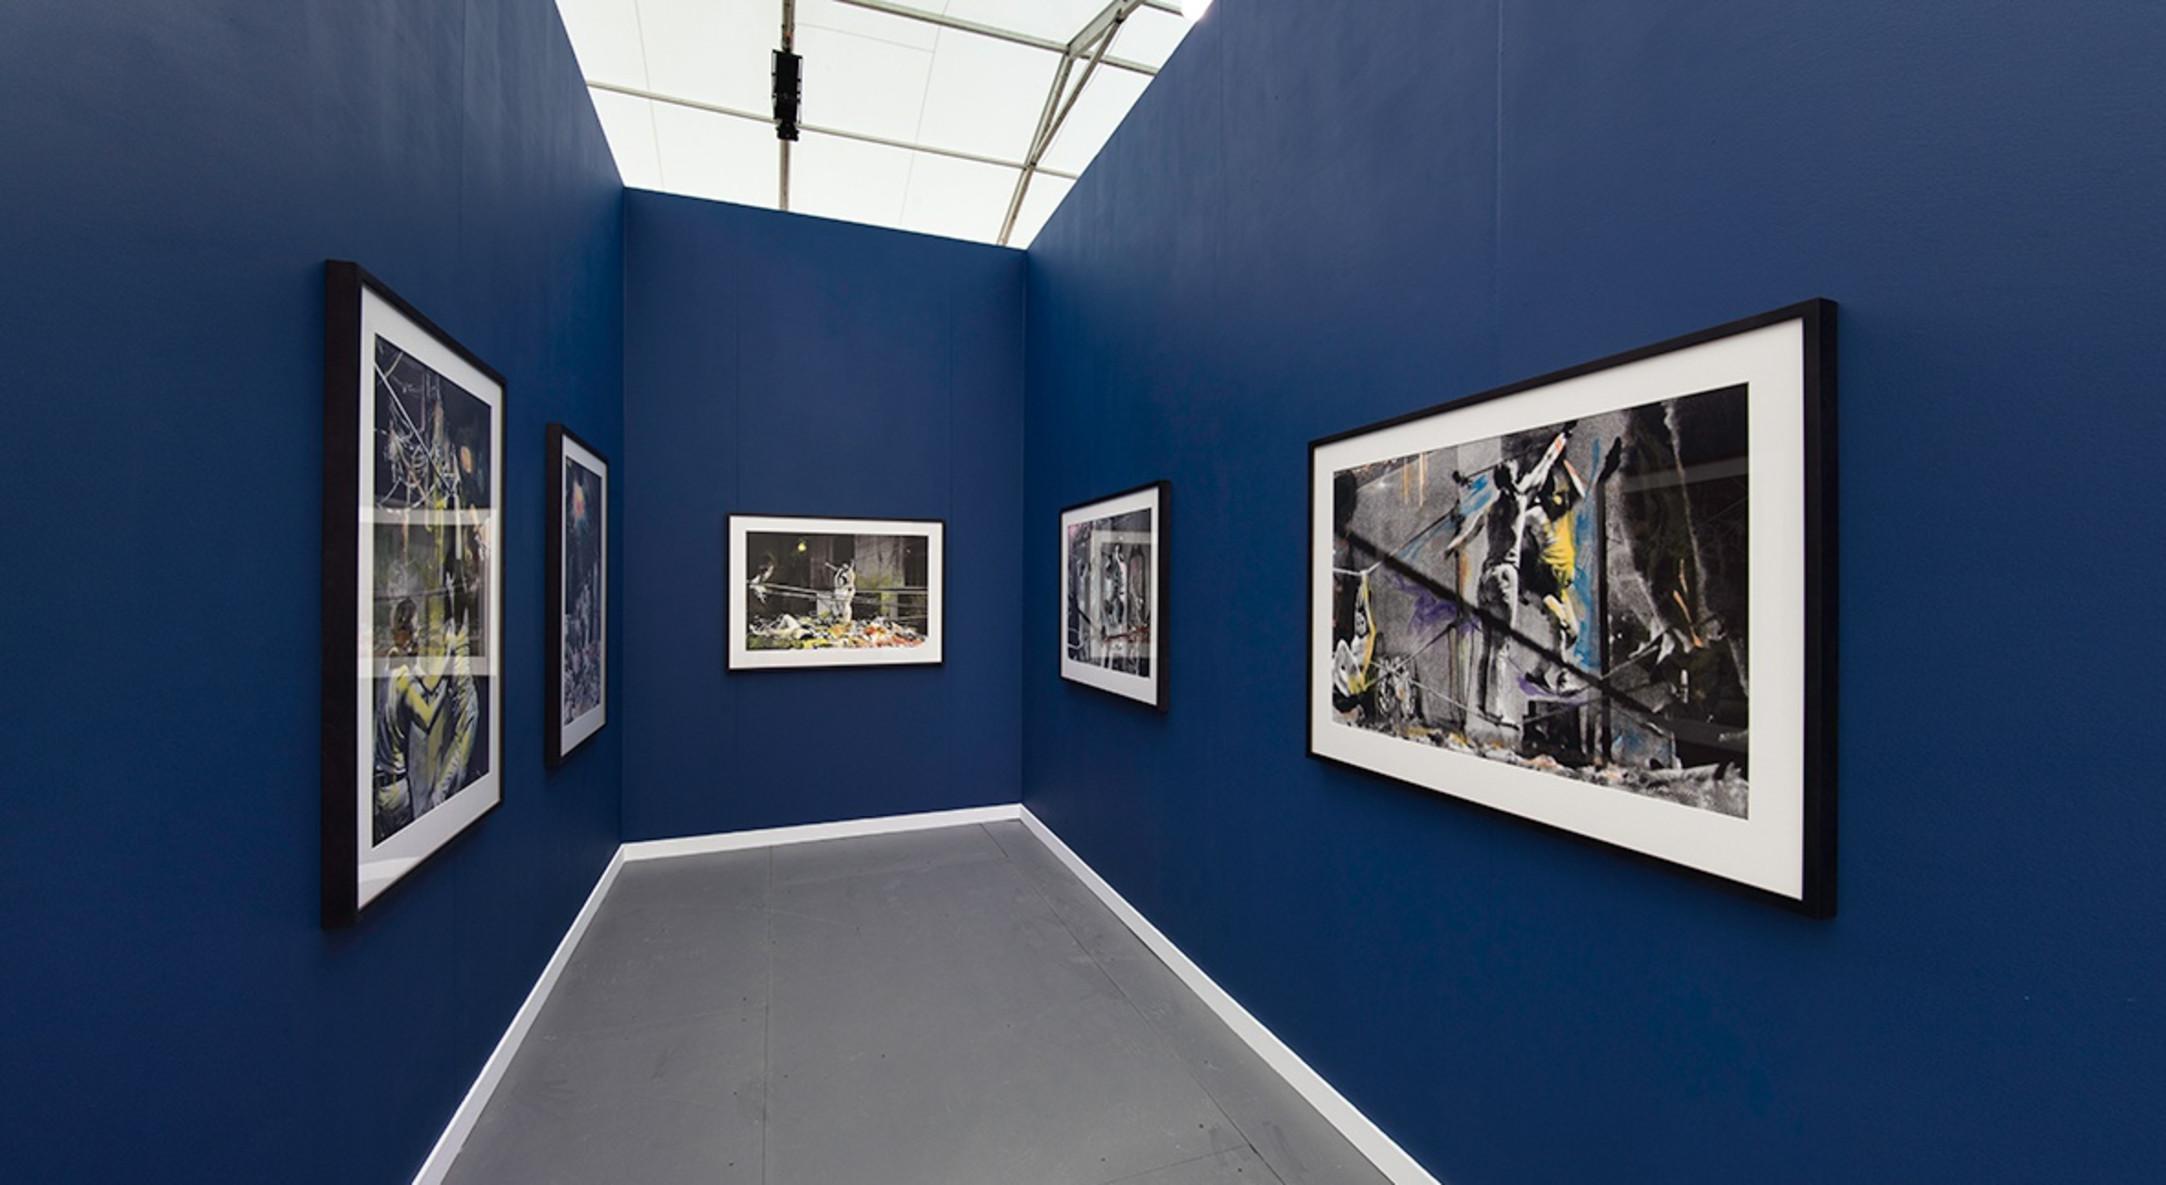 Installation view of Carolee Schneemann at Hales Gallery Booth (Spotlight) at Frieze New York 2015